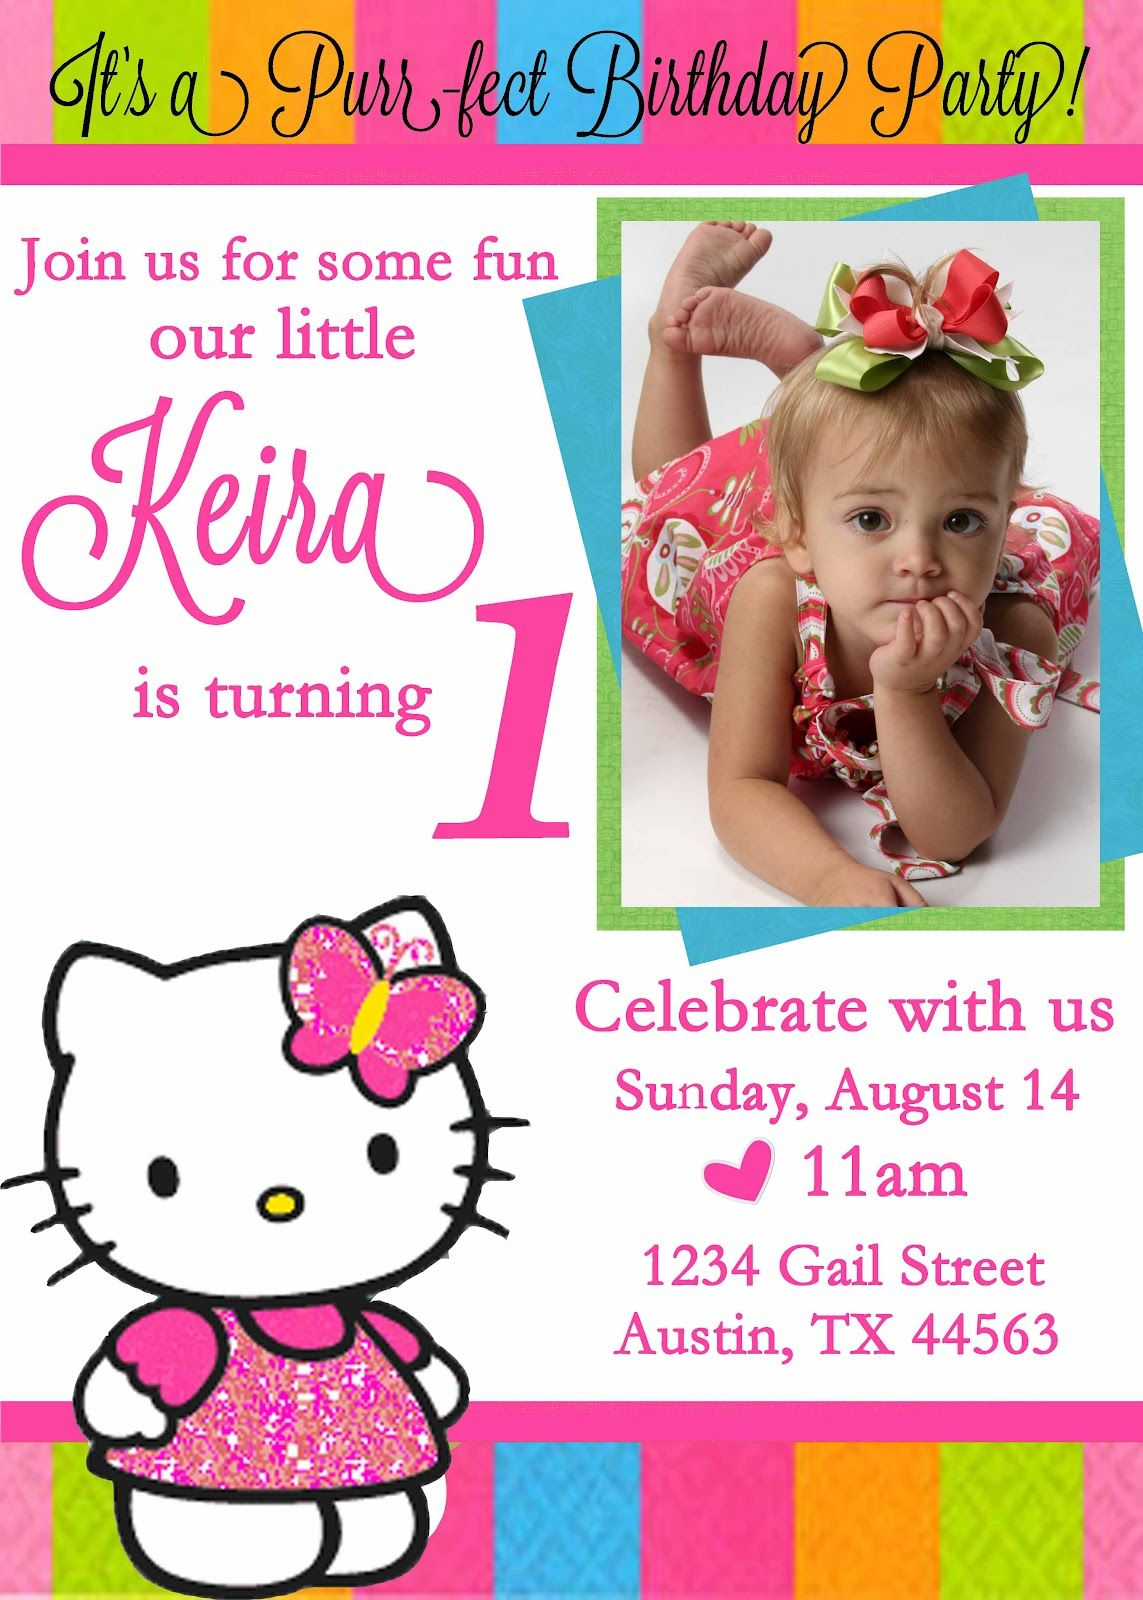 Personalized Hello Kitty Birthday Invitations - | Free Printable - Hello Kitty Free Printable Invitations For Birthday